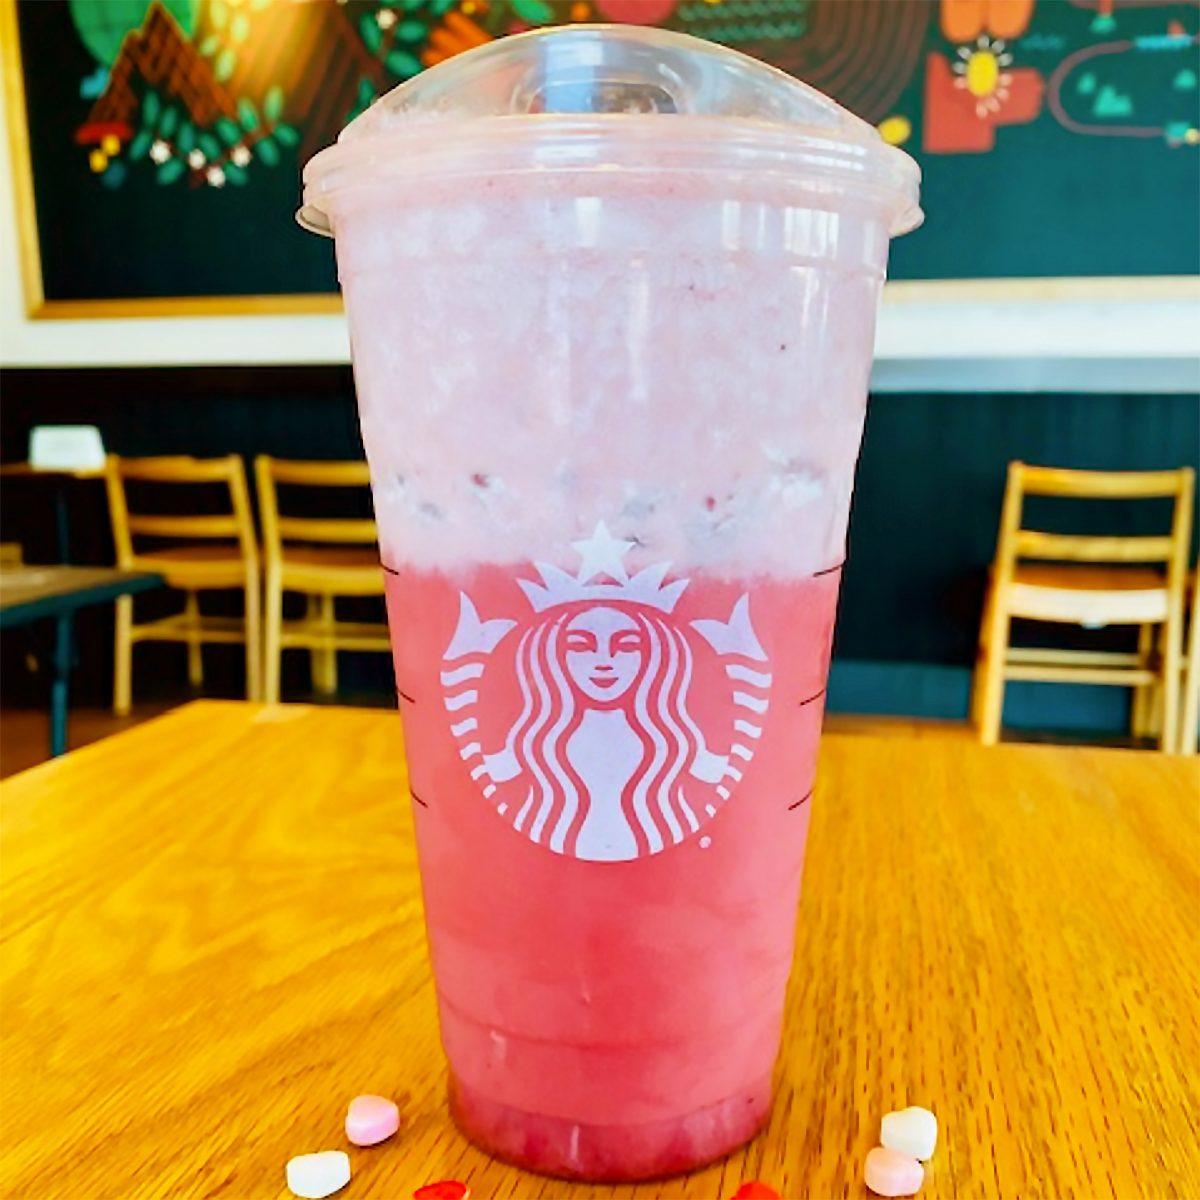 Starbucks Love On The Rocks drink from secret menu